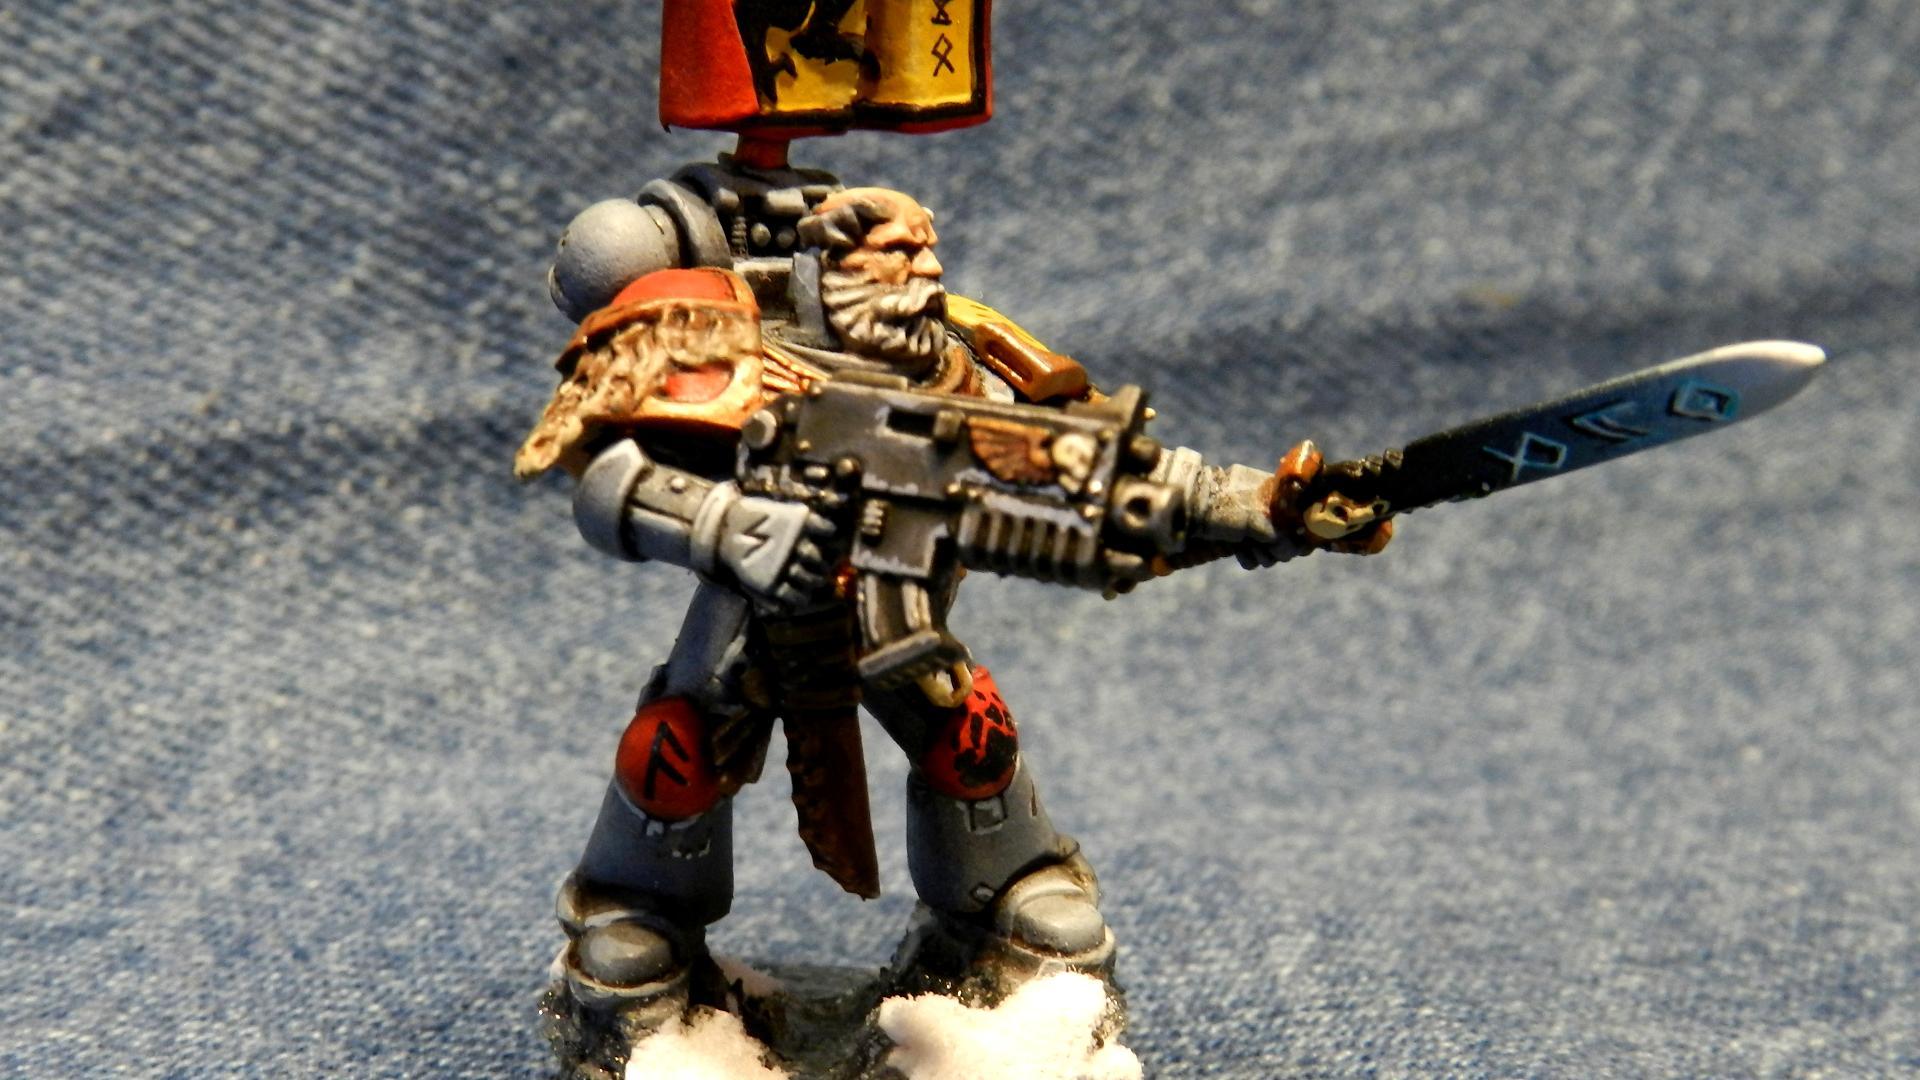 Grey Hunter, Motw, Snow, Space Wolves, Warhammer 40,000, Wolf Guard, Wulfen